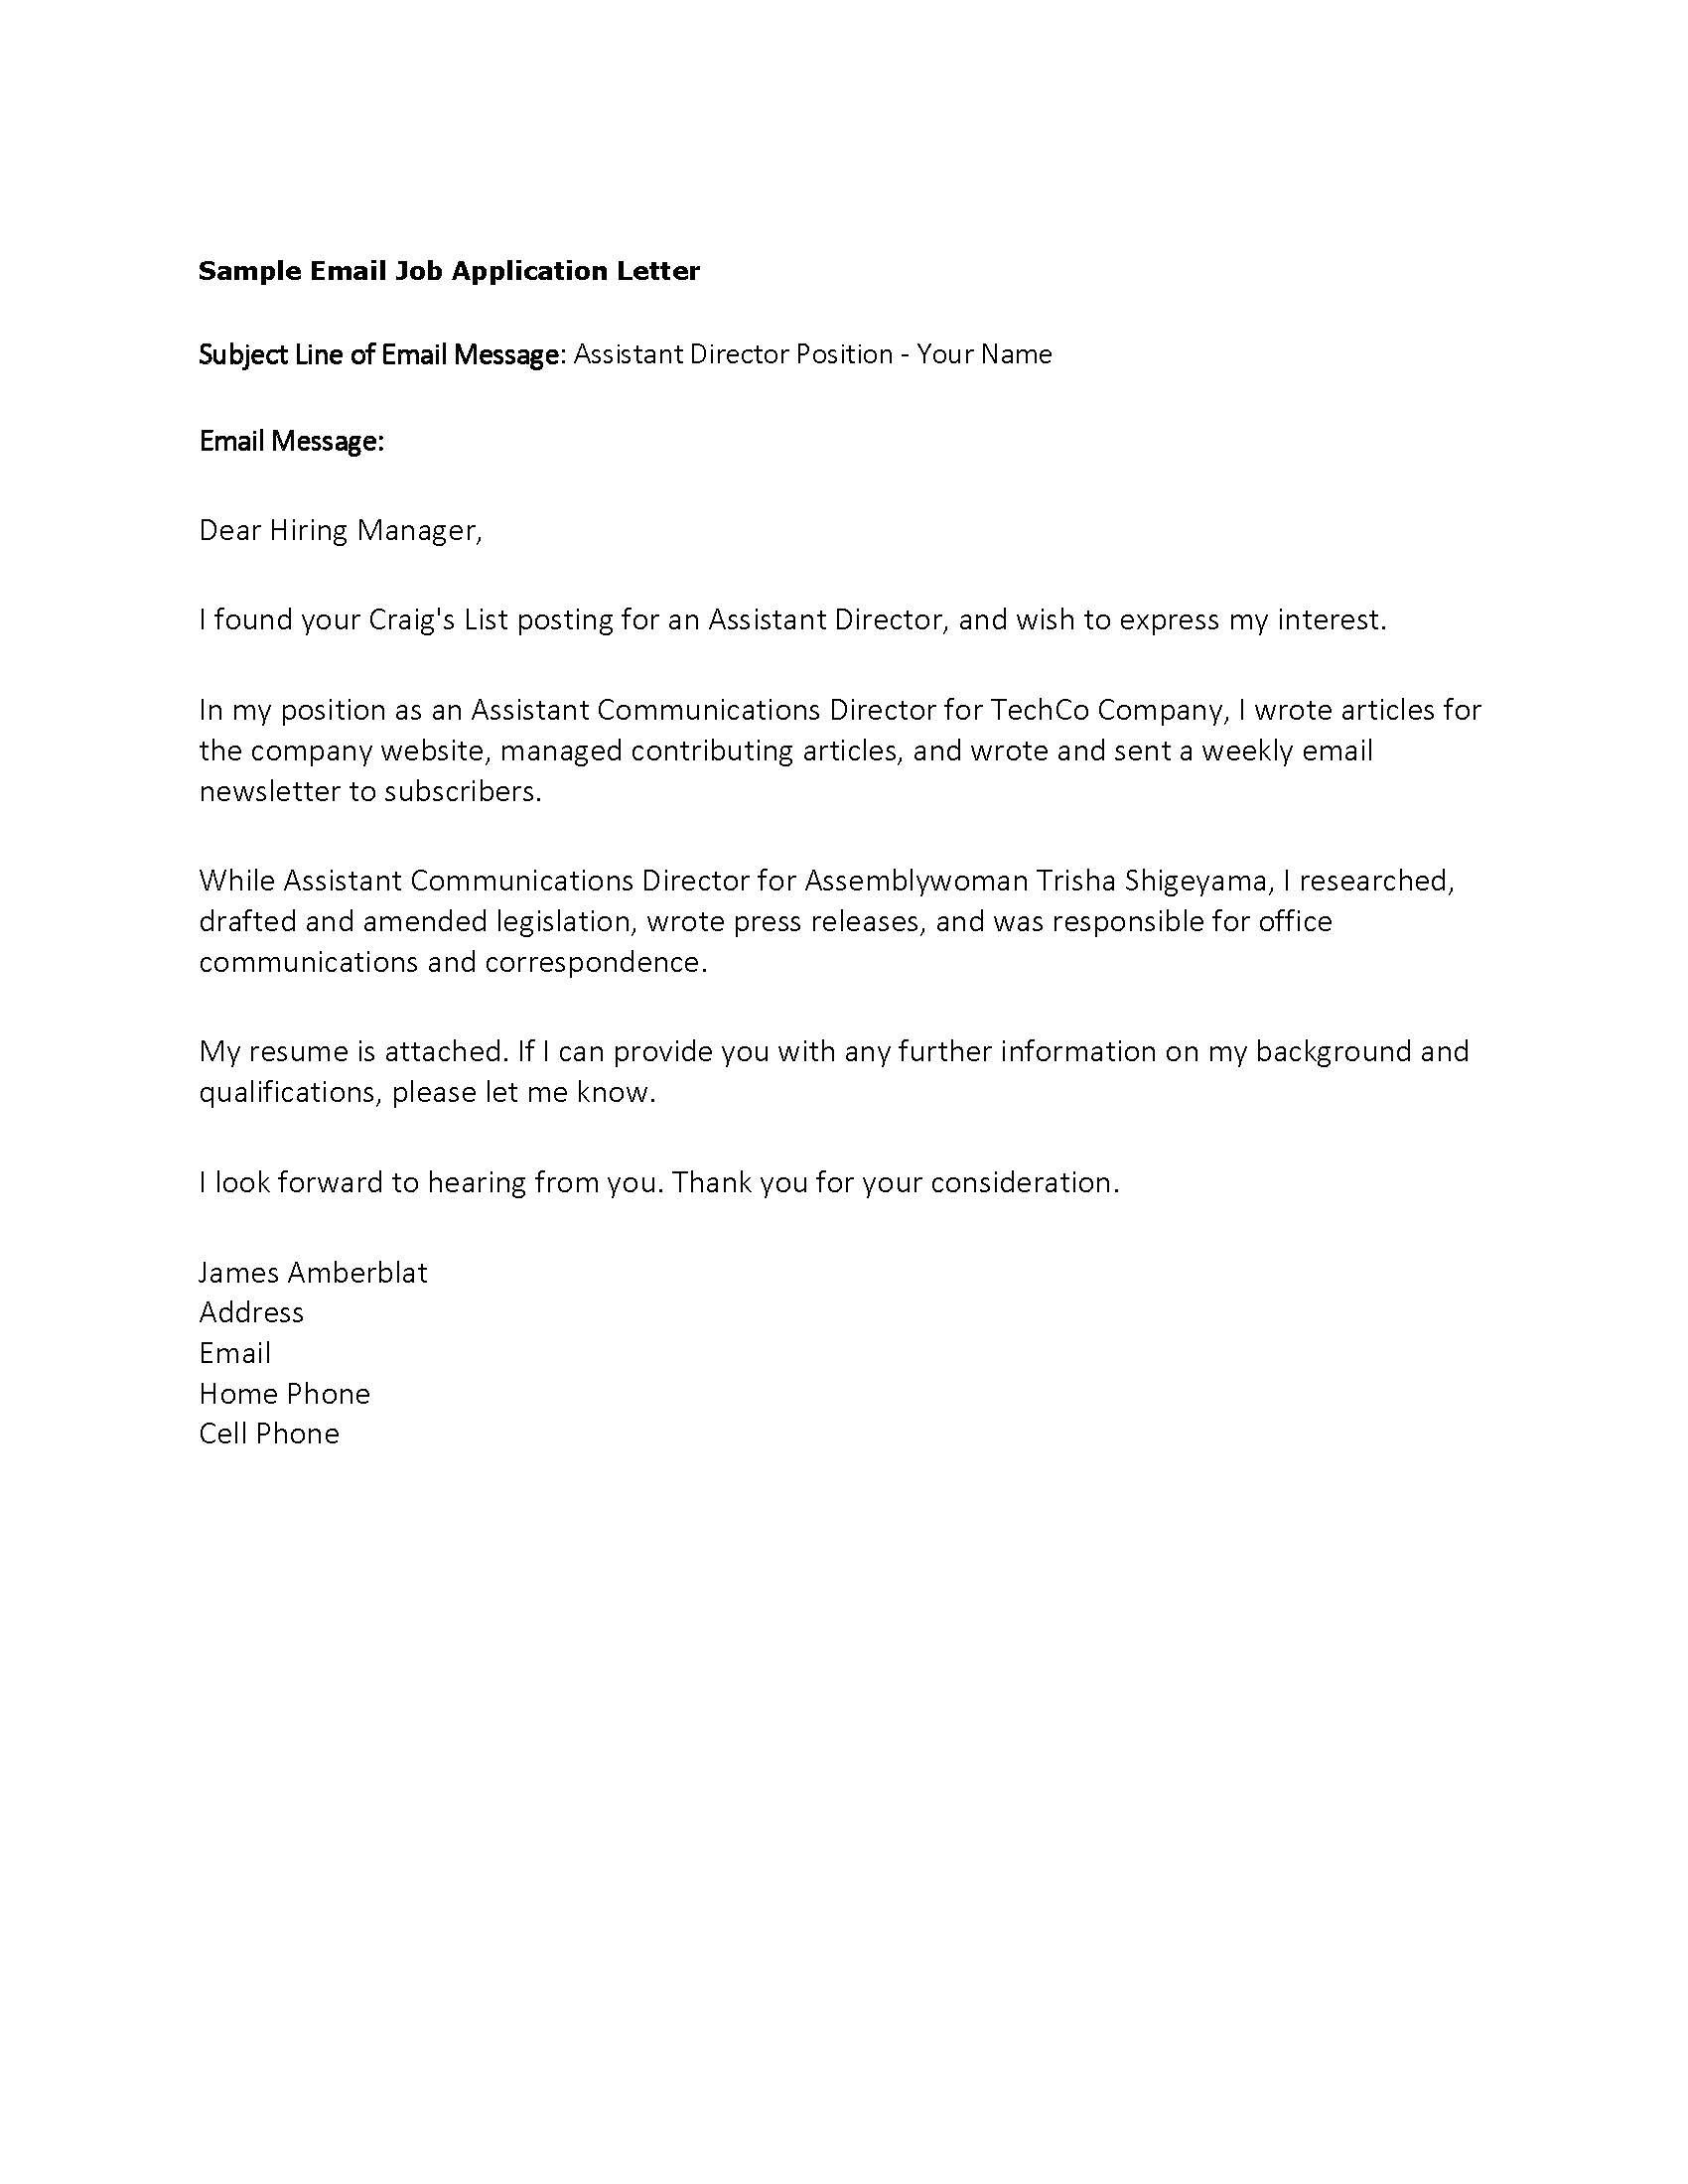 job application letter email sample